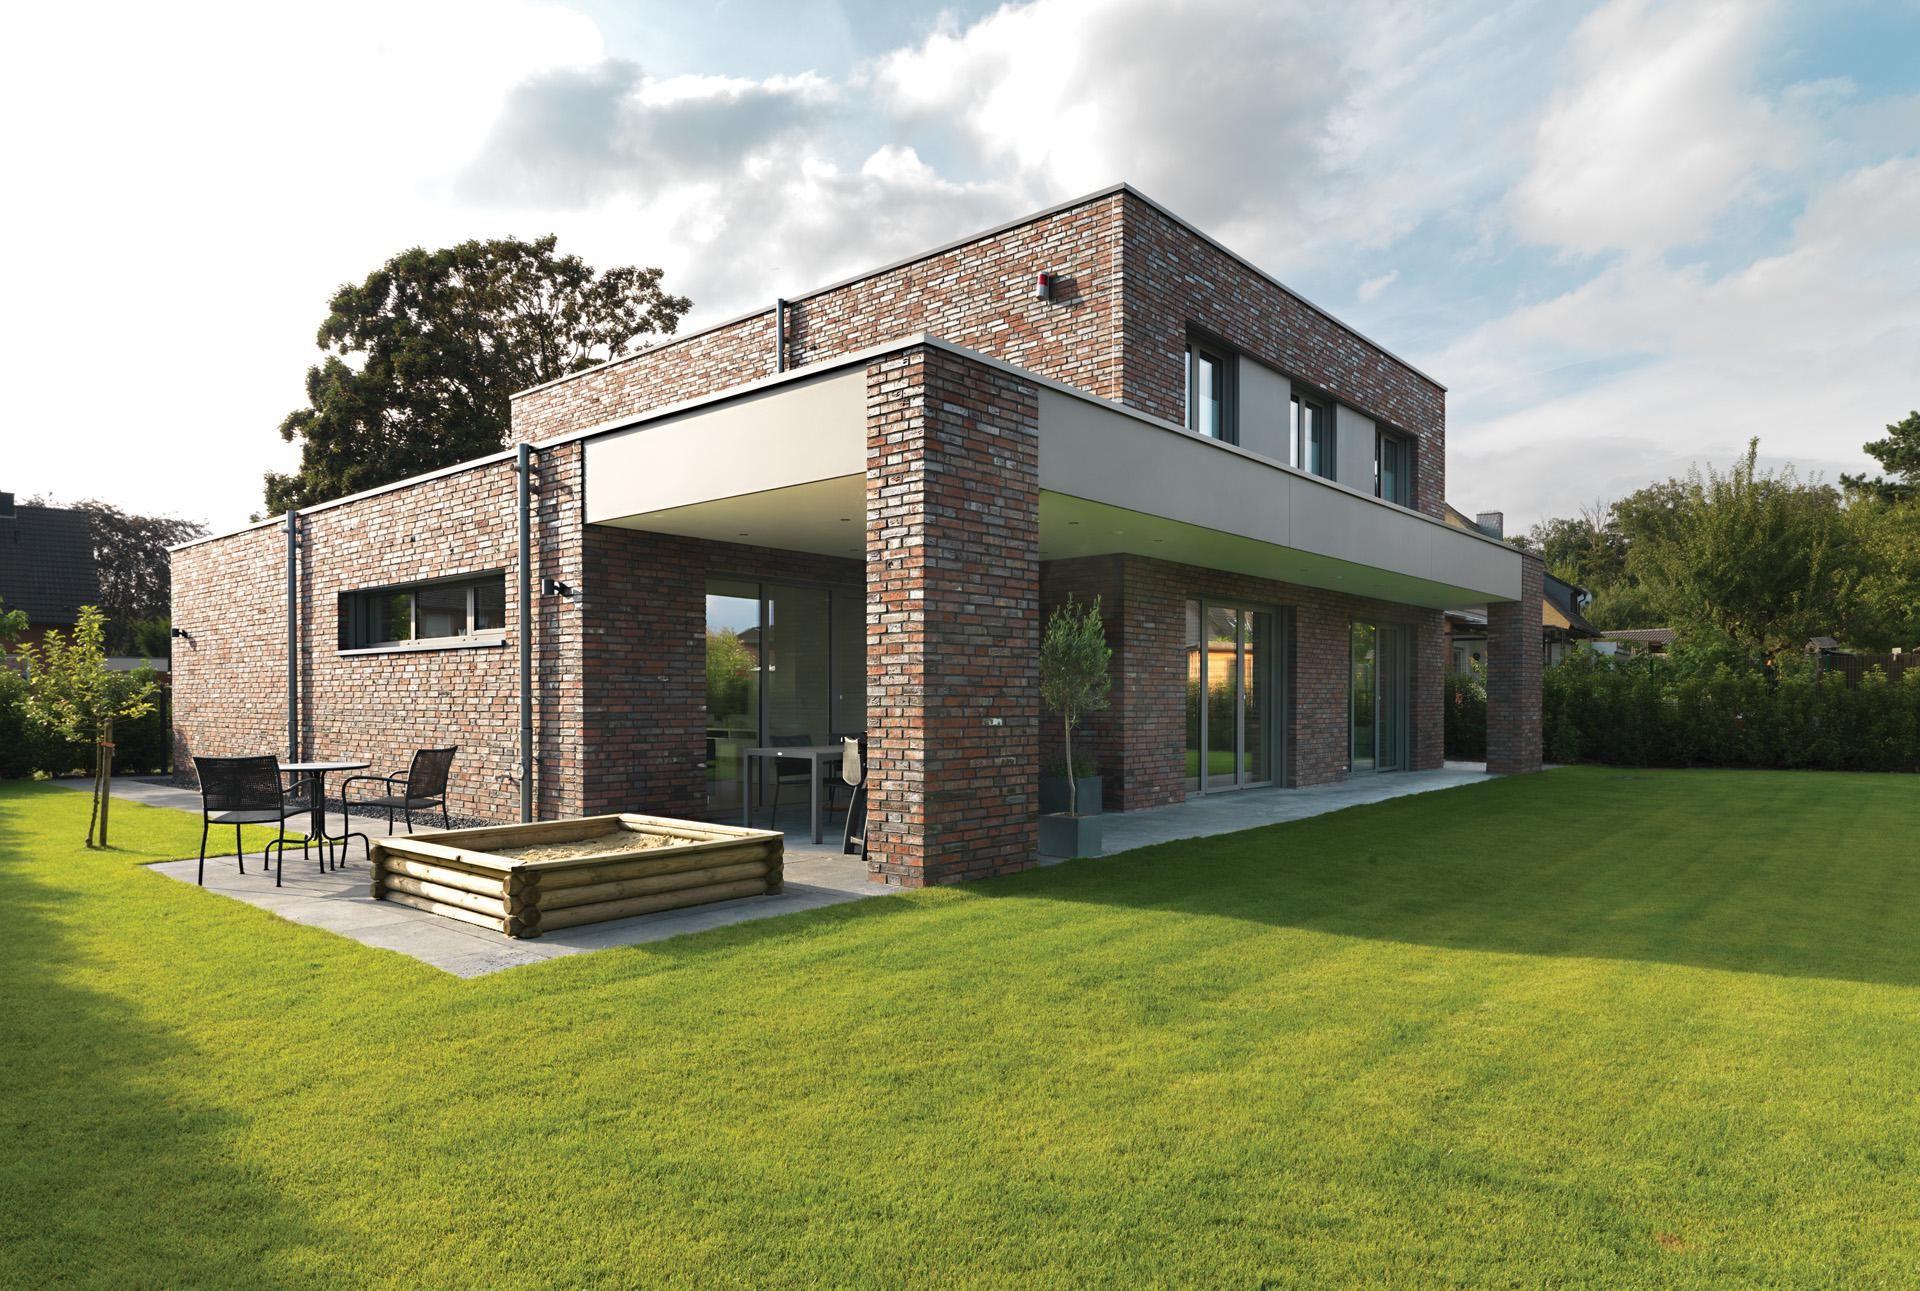 Bauhaus Wegberg - Gillrath Klinker | Haus | Pinterest | Bauhaus